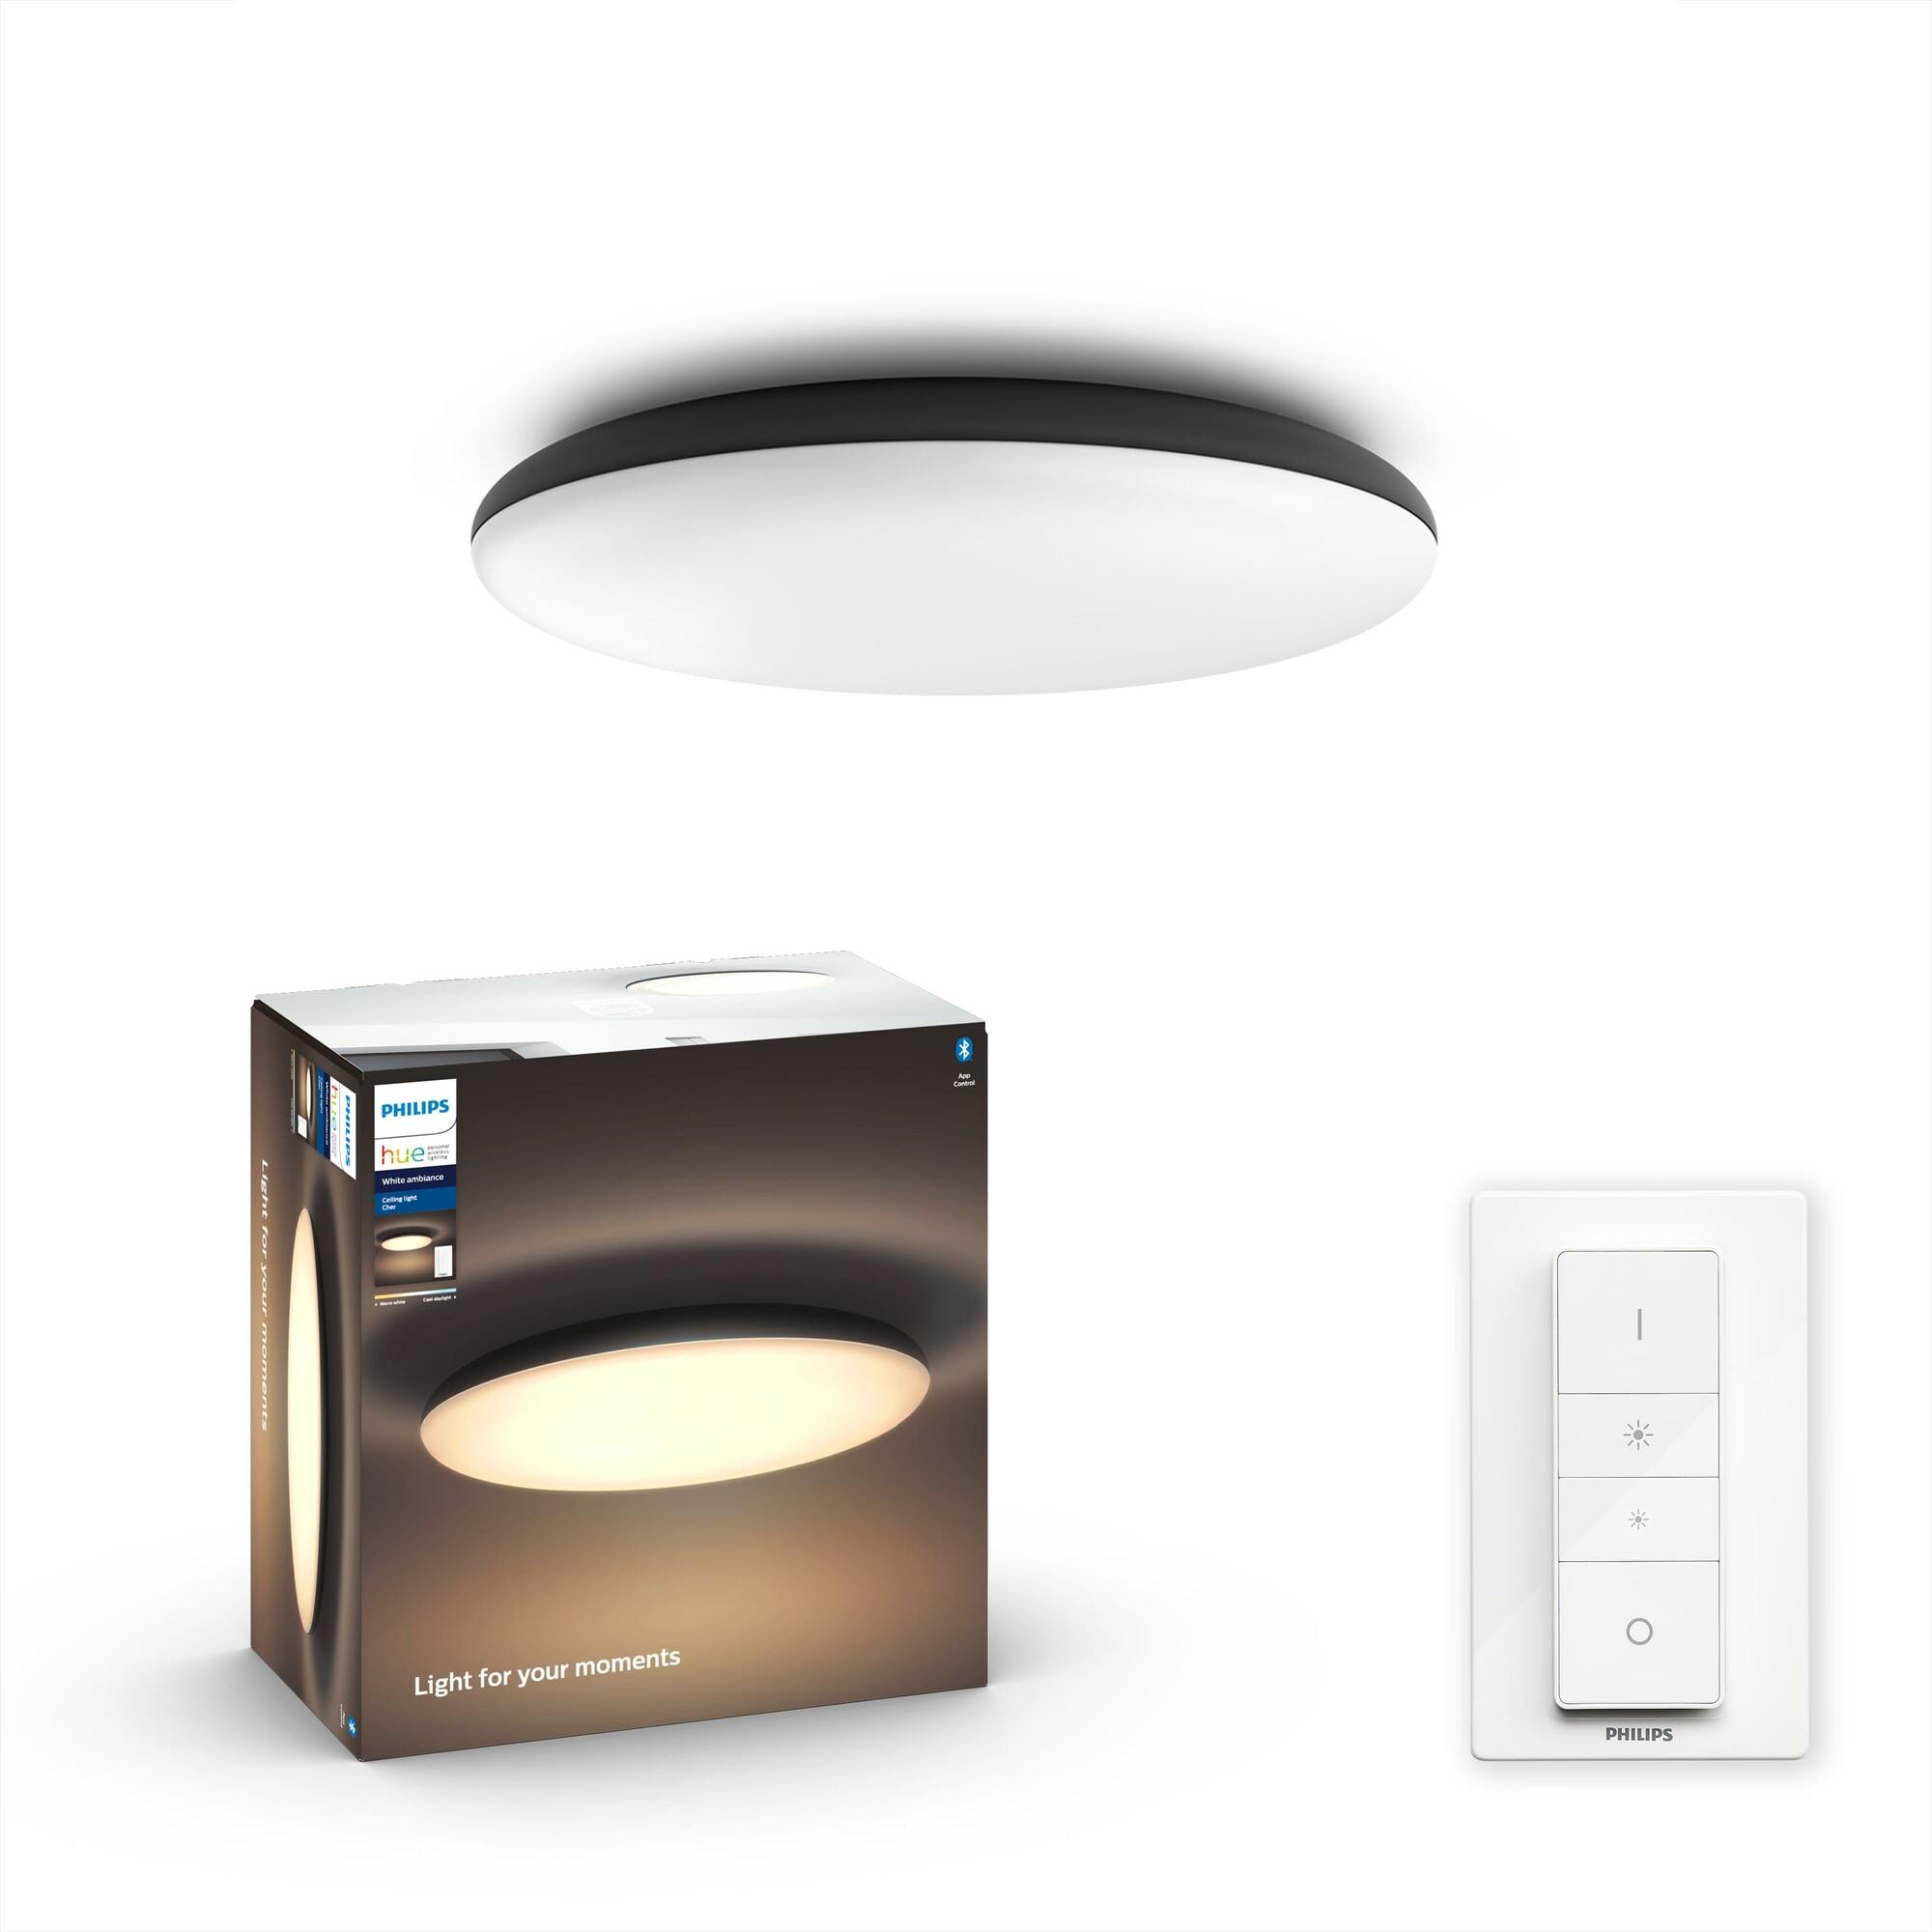 Philips HUE CHER Plafondlamp LED 1x33,5W/3000lm Zwart